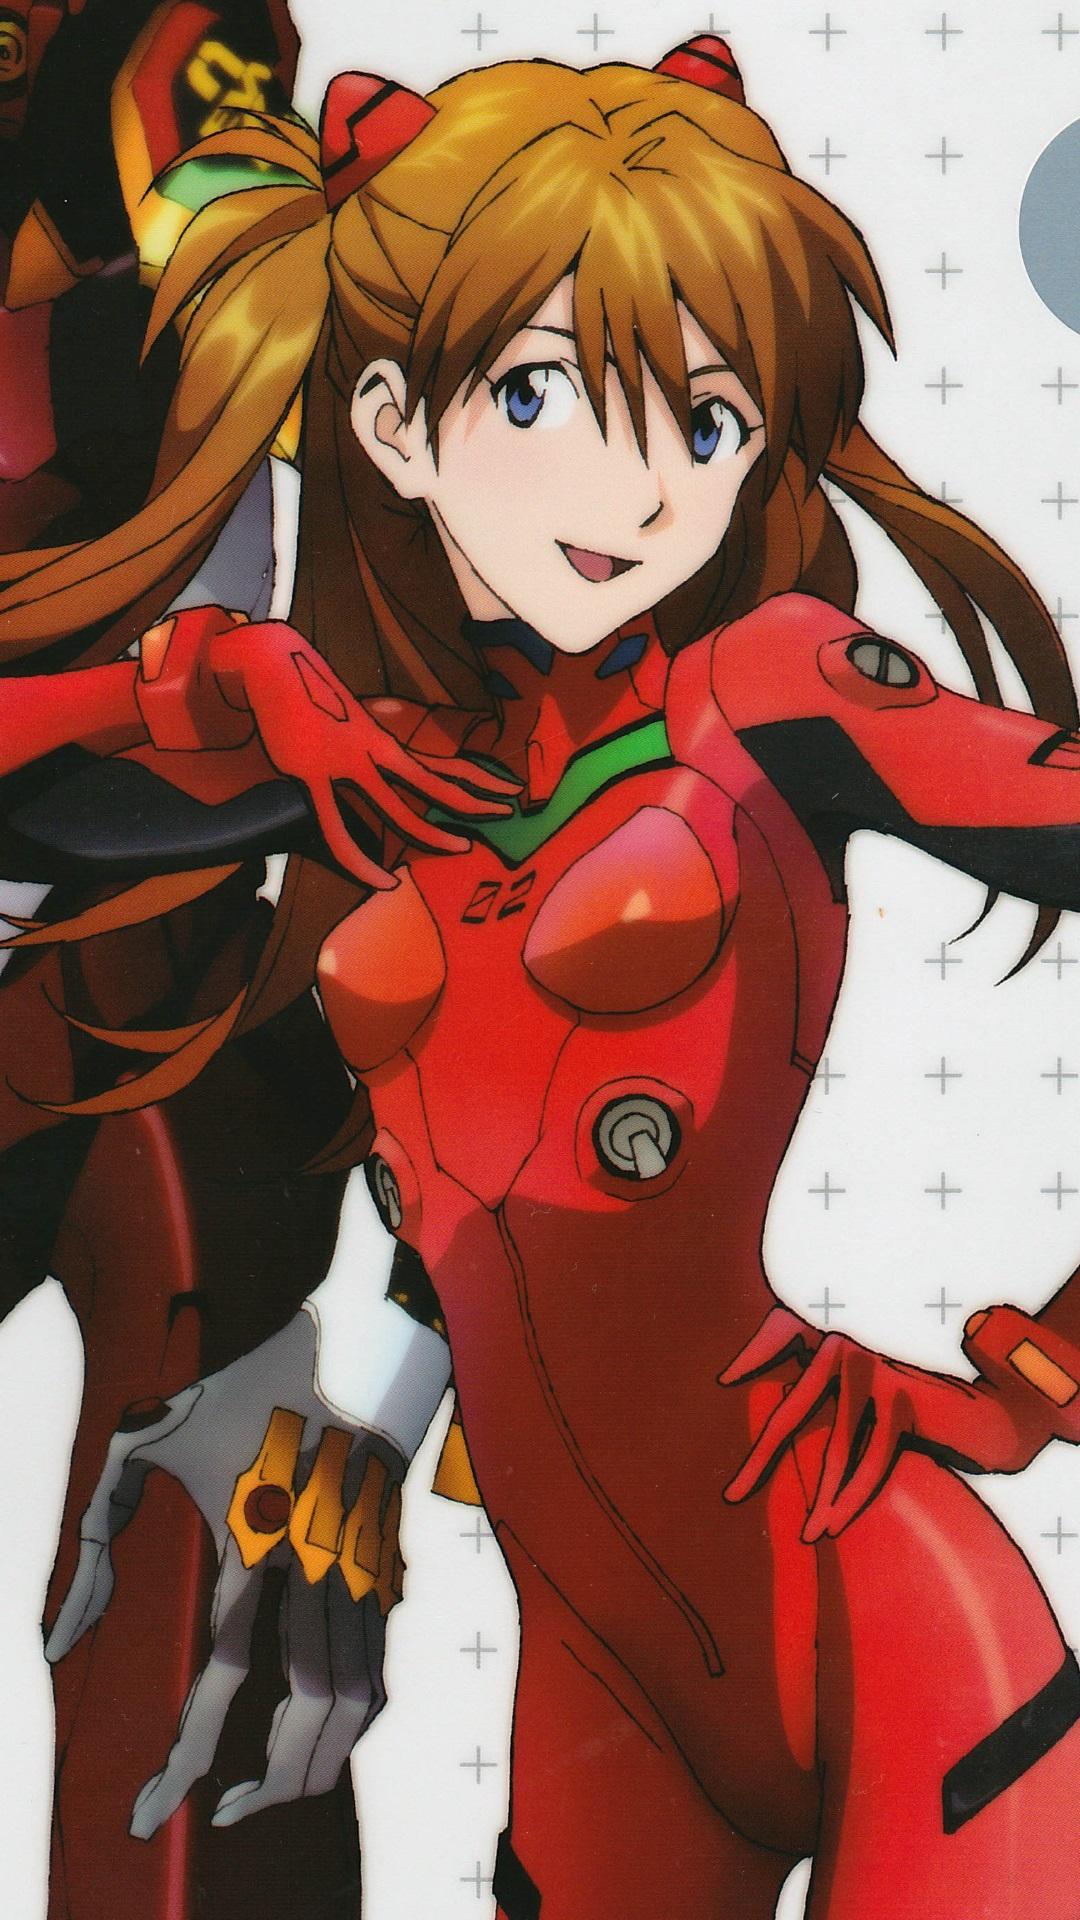 Anime picture neon genesis evangelion gainax soryu asuka langley shikinami asuka langley nenobi